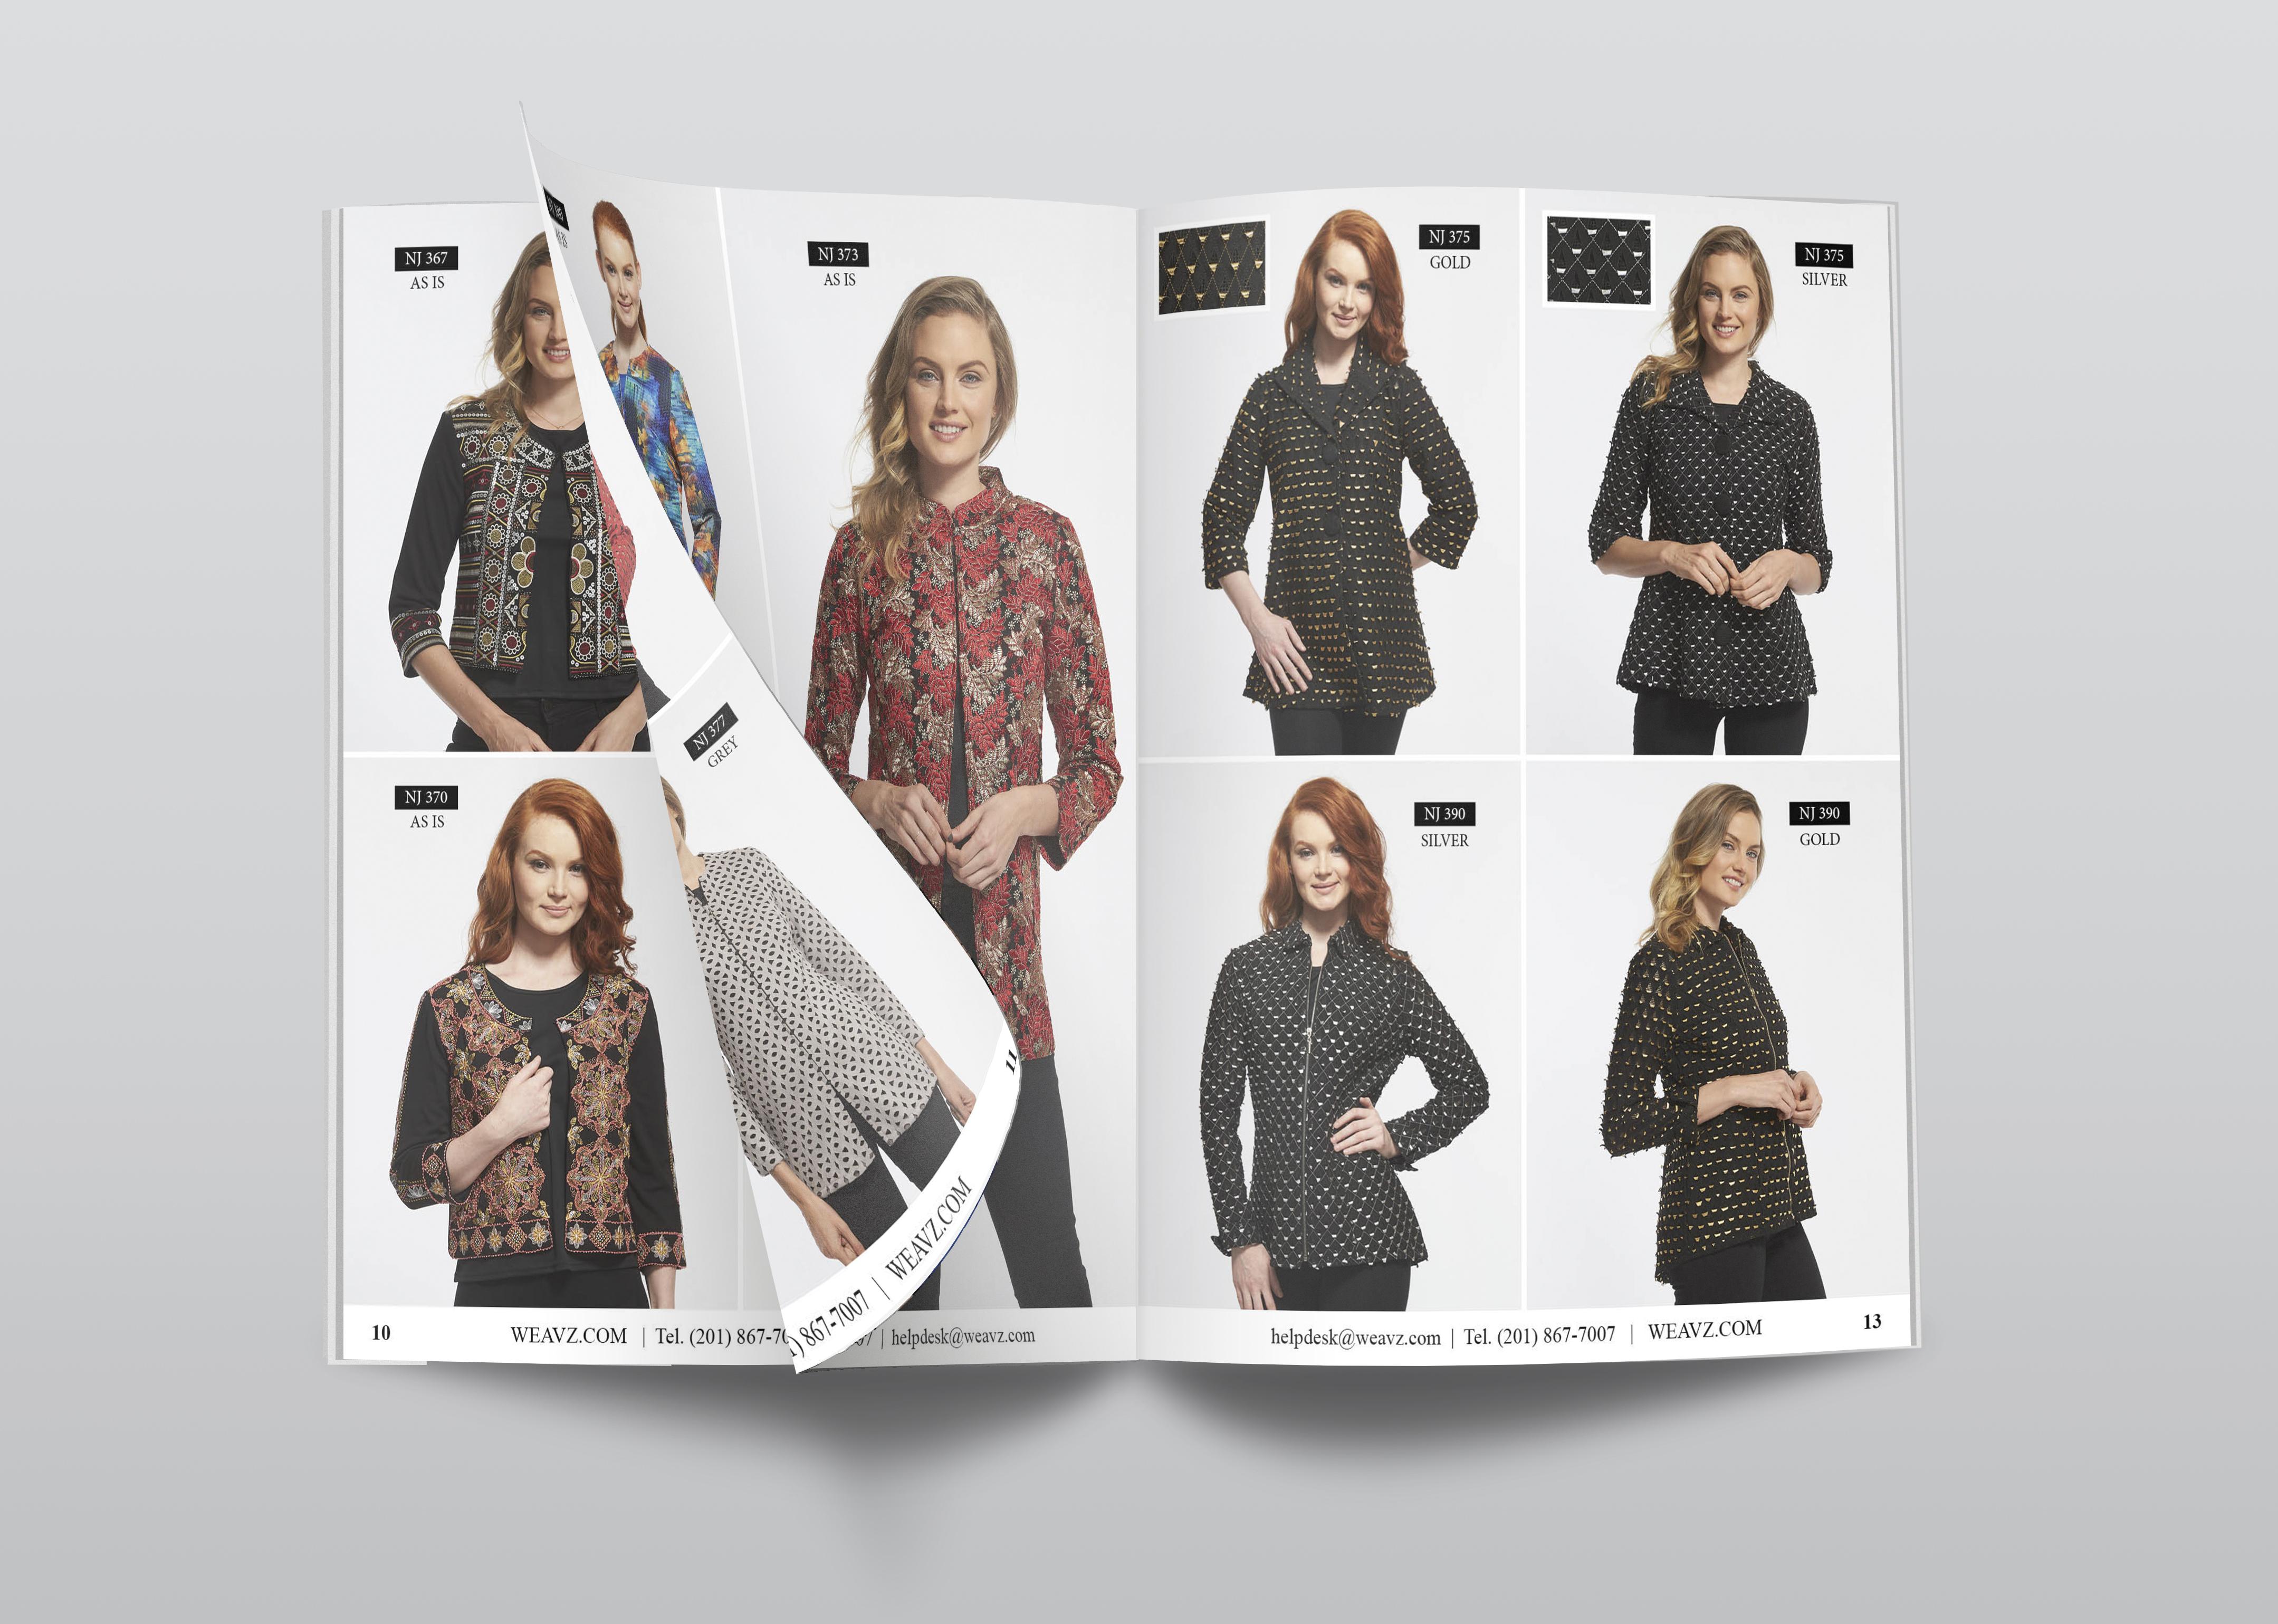 catalog design & layout